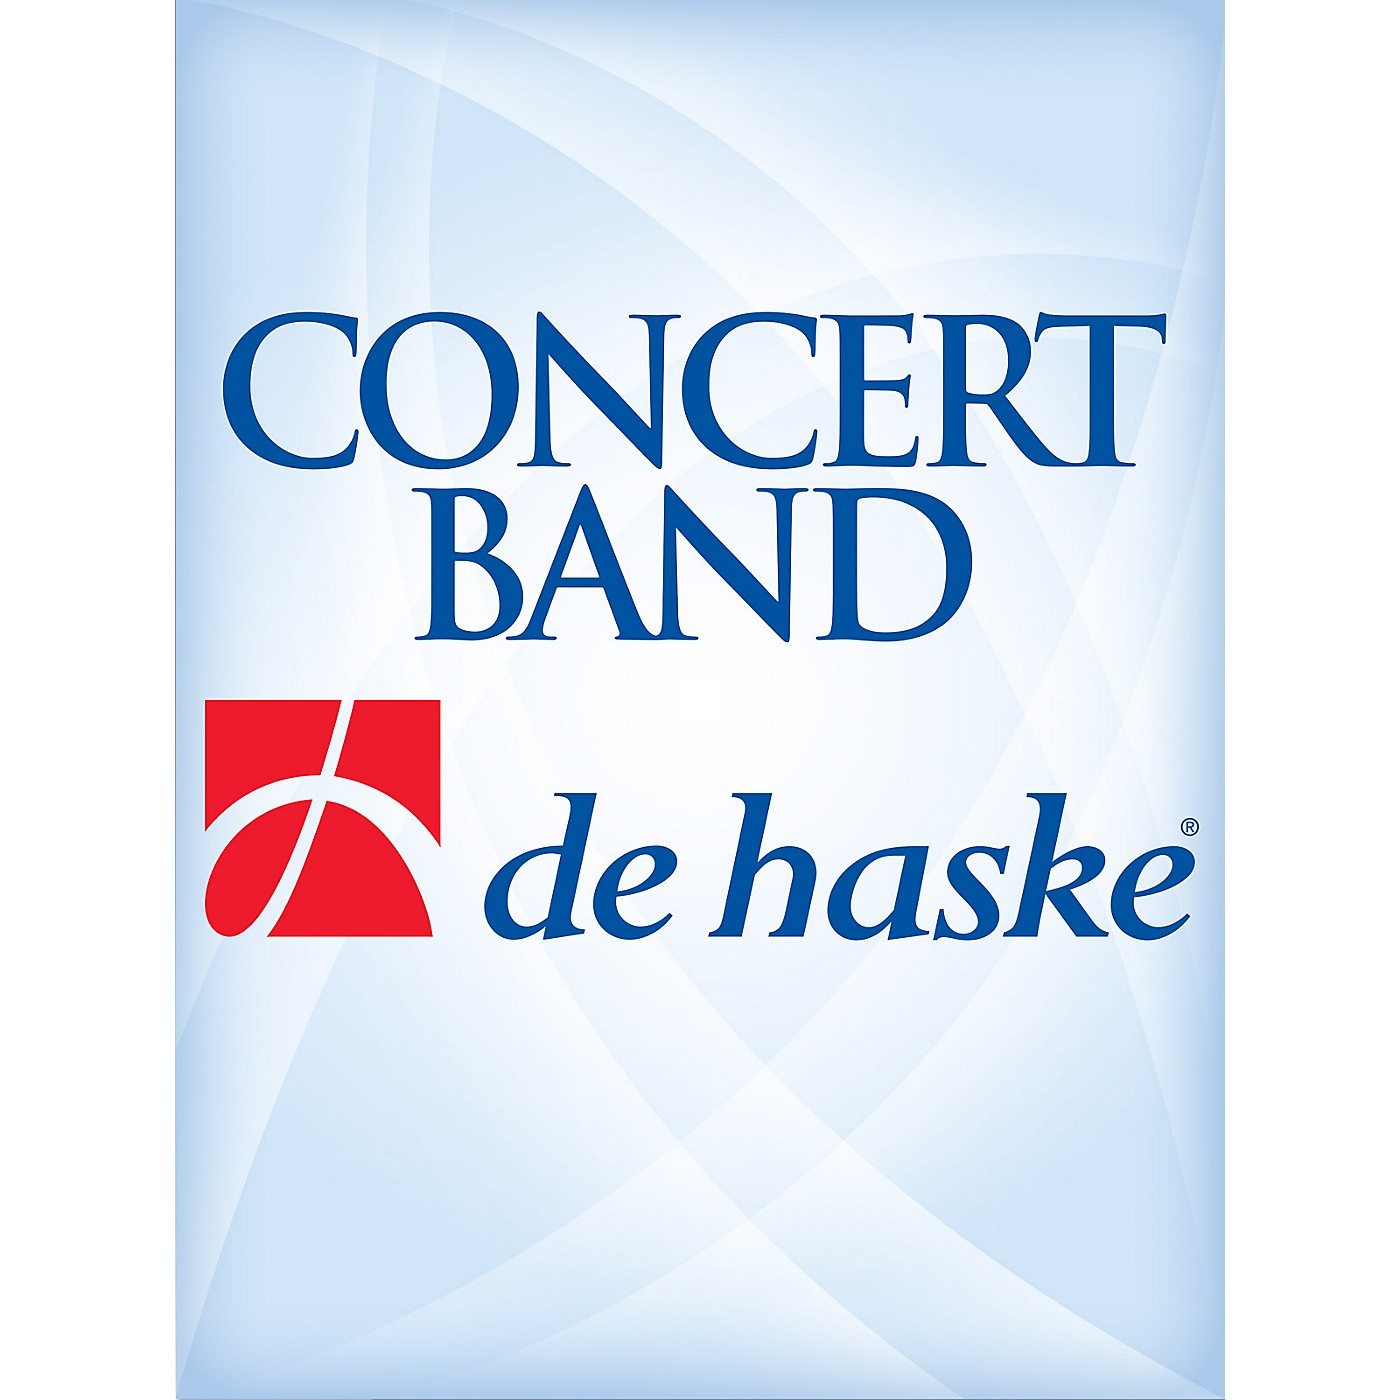 De Haske Music Chorale from Cantata No. 79 Now Thank We All Our God (Nun Danket Alle Gott) Concert Band Level 2.5 by Robert van Beringen thumbnail